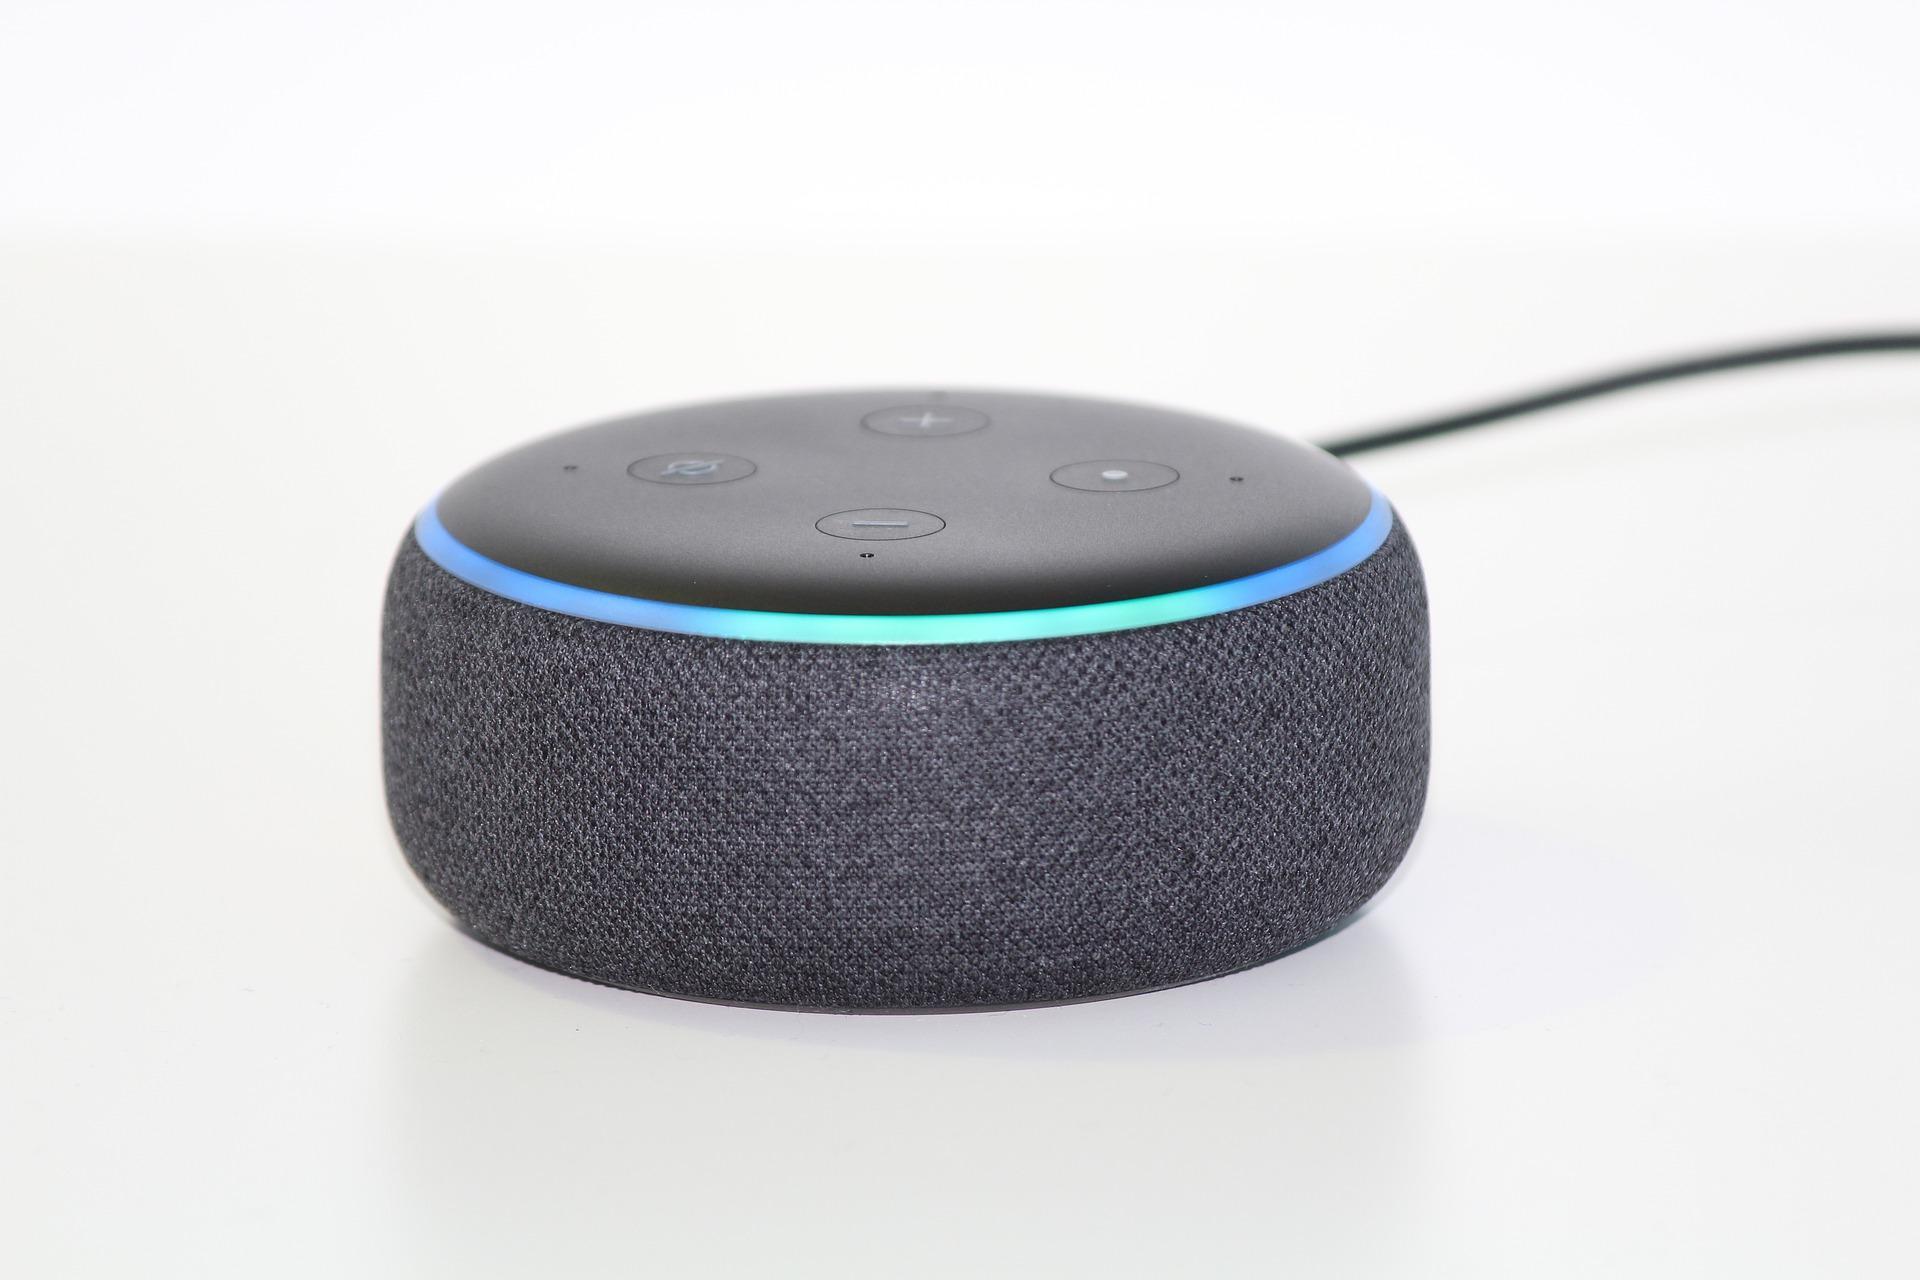 Photo of an Amazon Alexa Dot